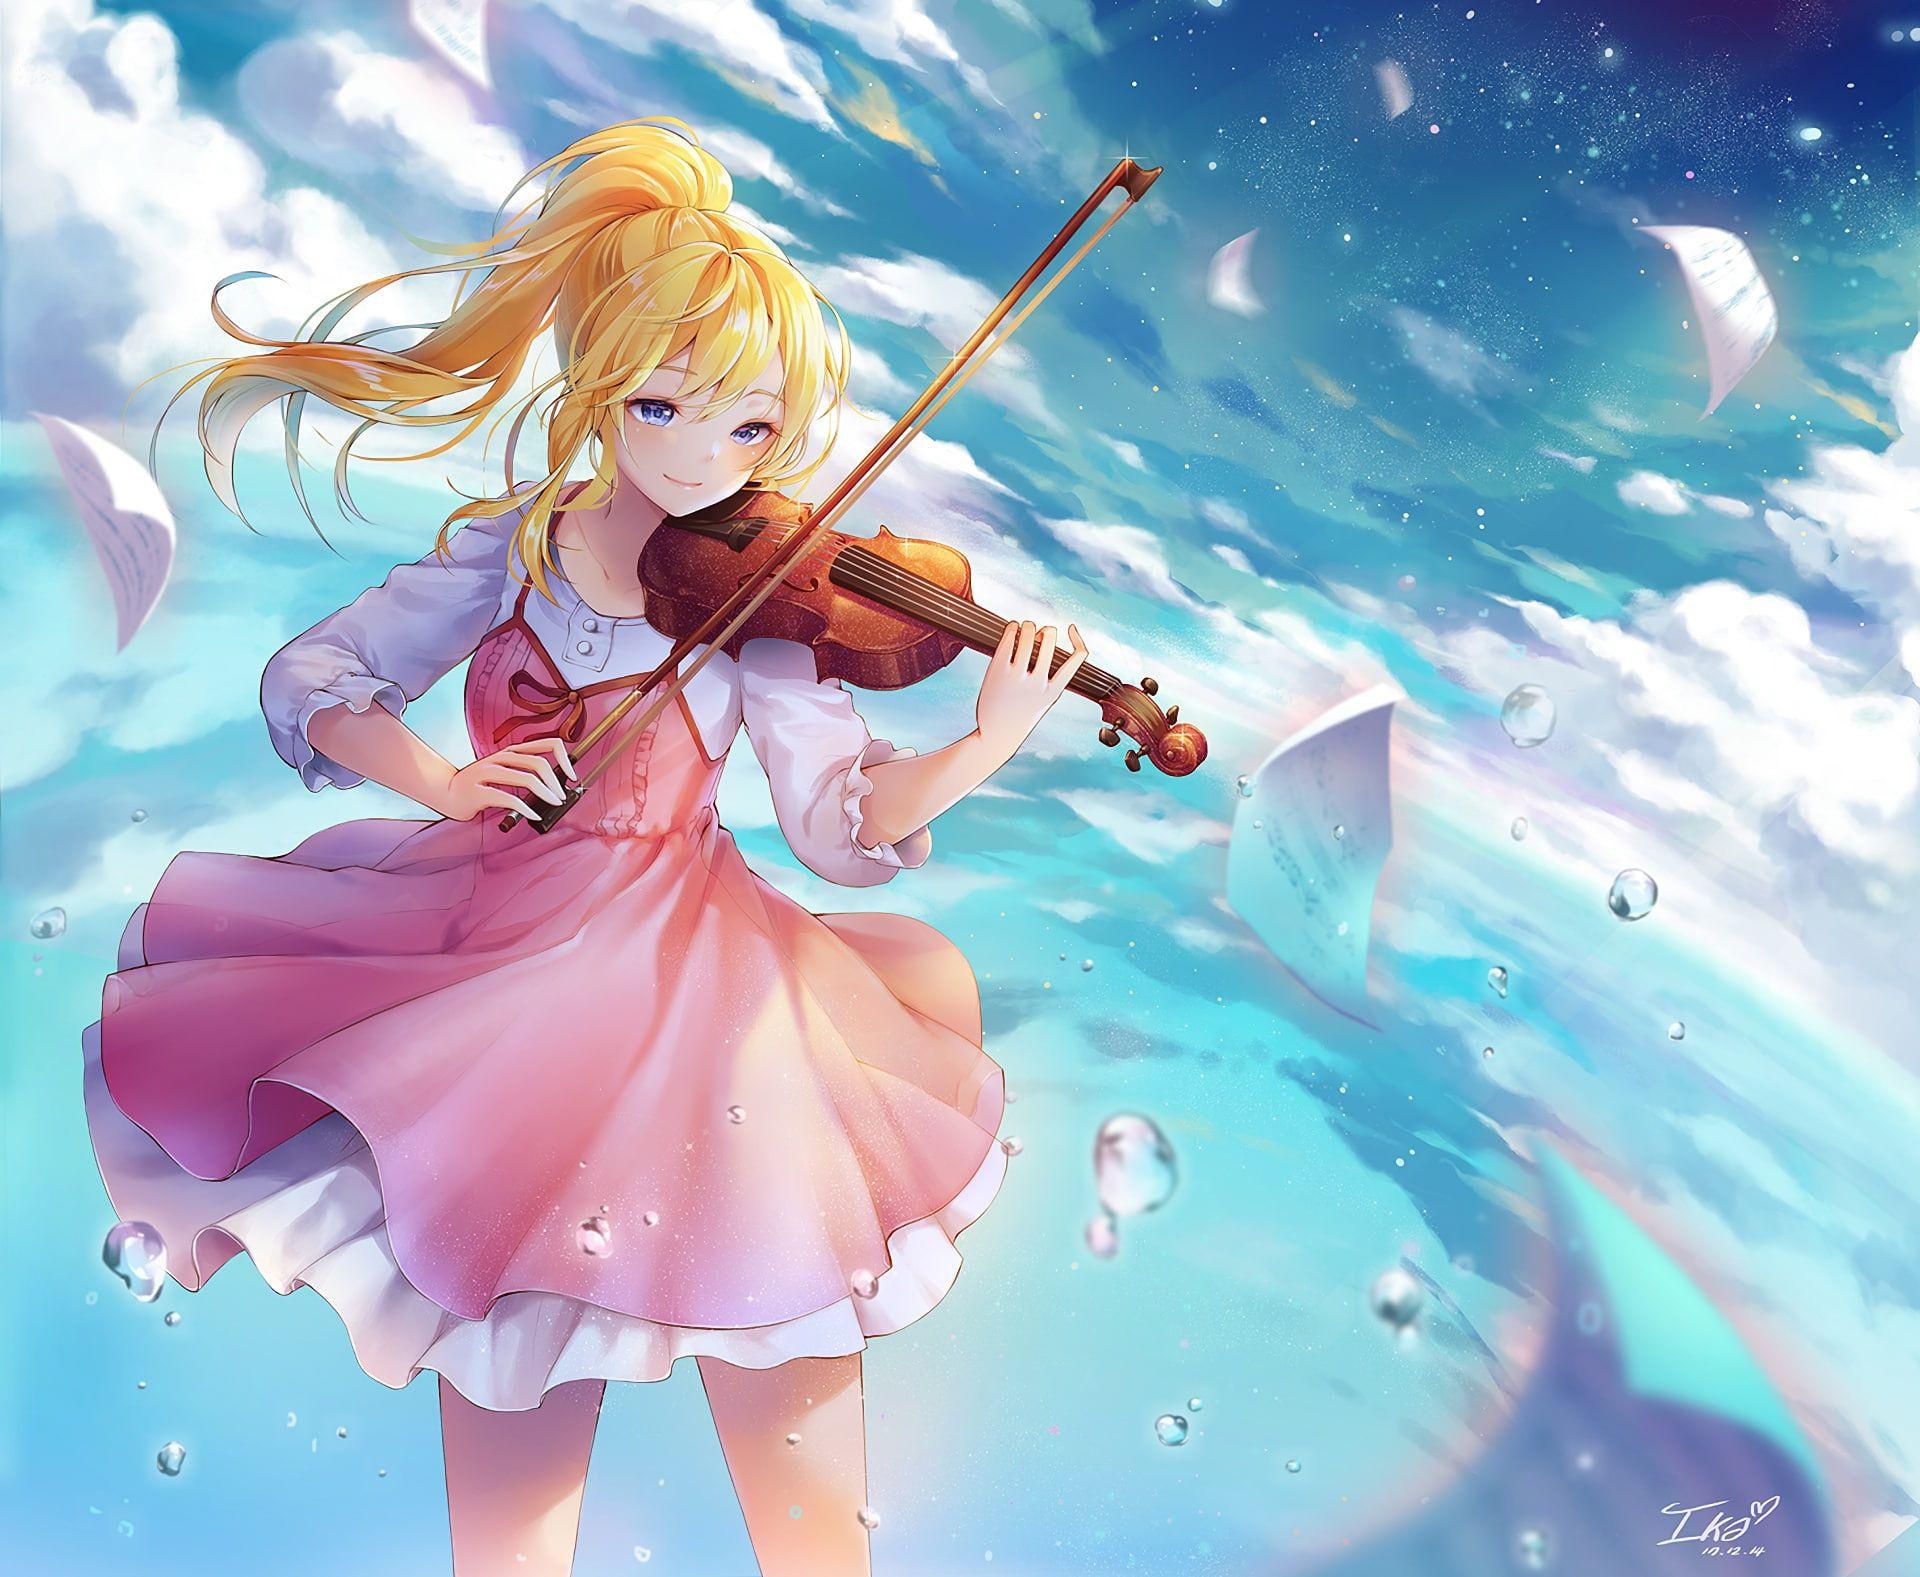 Look Girl Violin Anime Shigatsu Wa Kimi No Uso 1080p Wallpaper Hdwallpaper Desktop In 2020 Your Lie In April Anime Anime Music